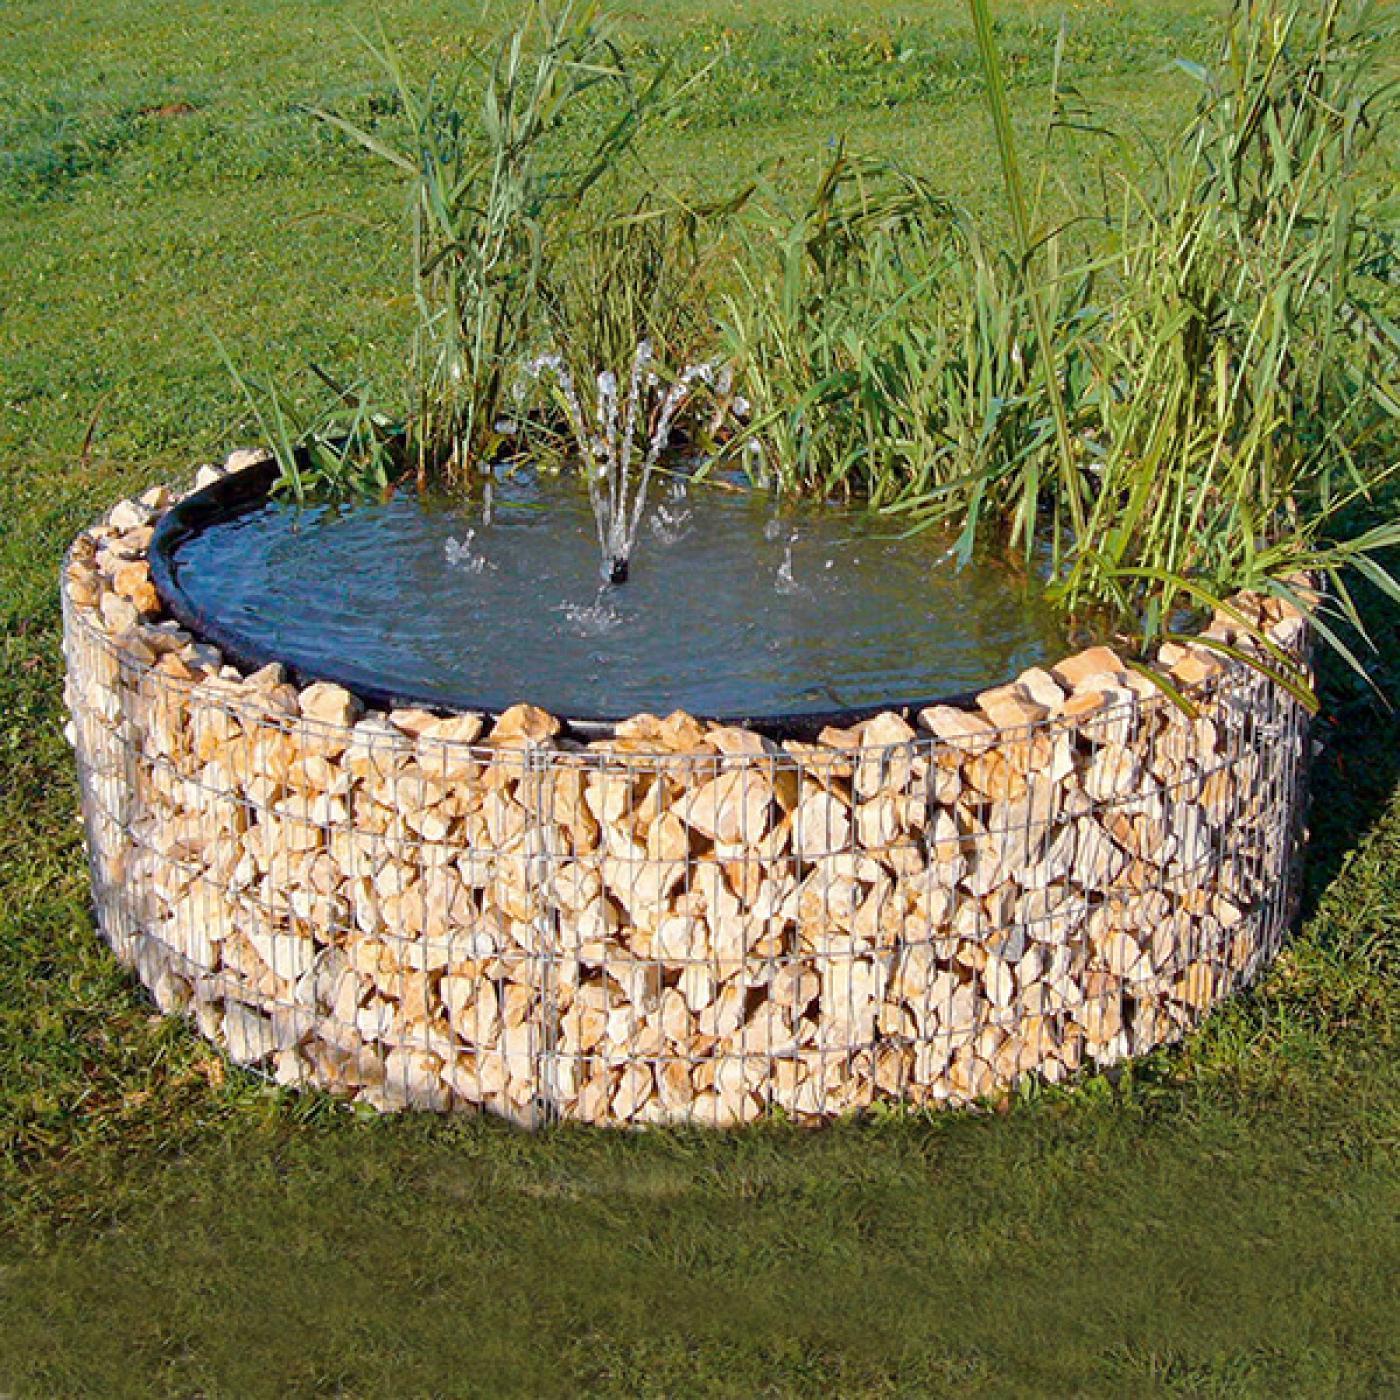 Olcs s mutat s megold s a kertbe k sz ts nk gabiont for Klein tuin uitleg